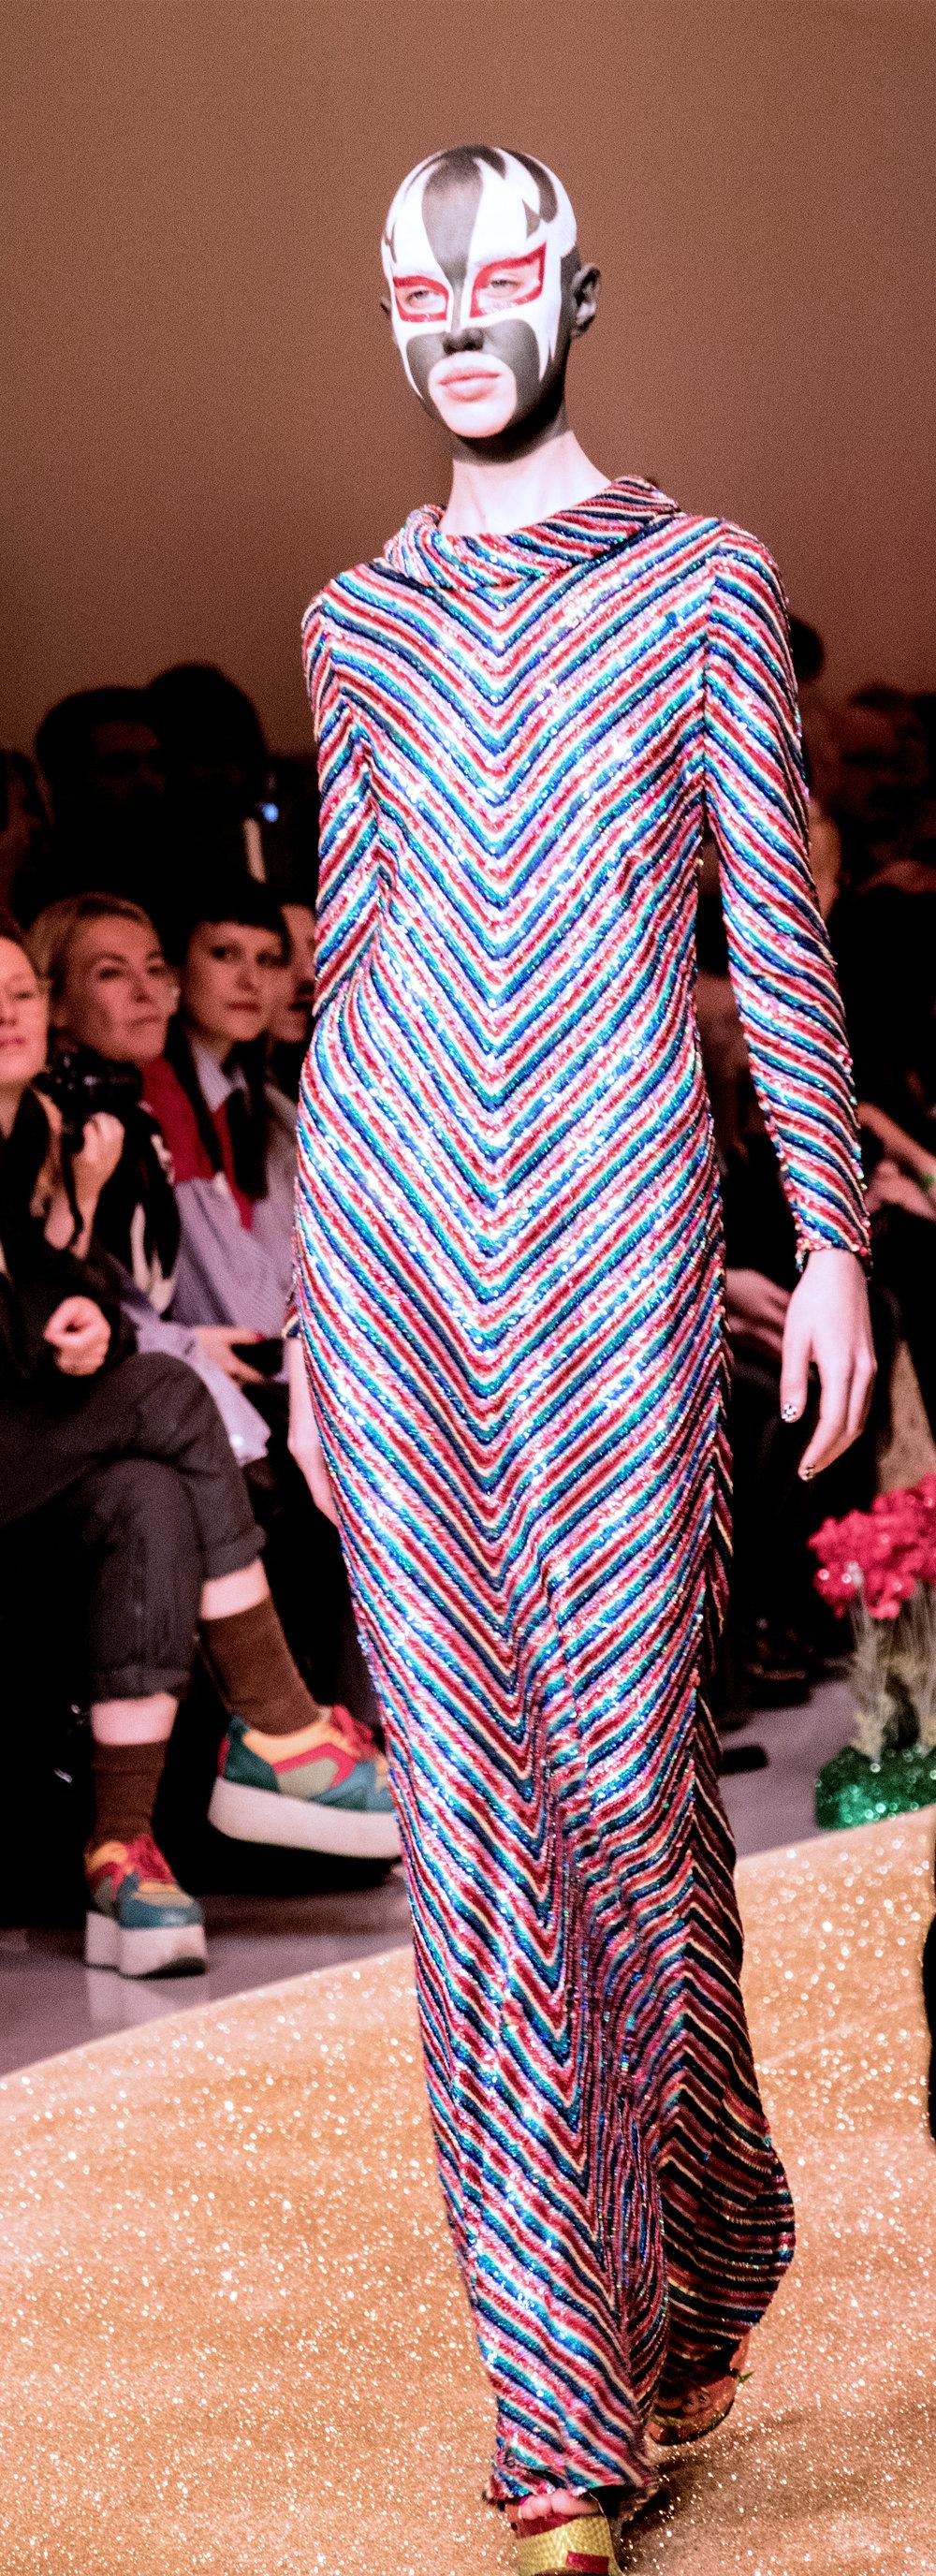 Ashish AW17 London Fashion Week 4.jpg